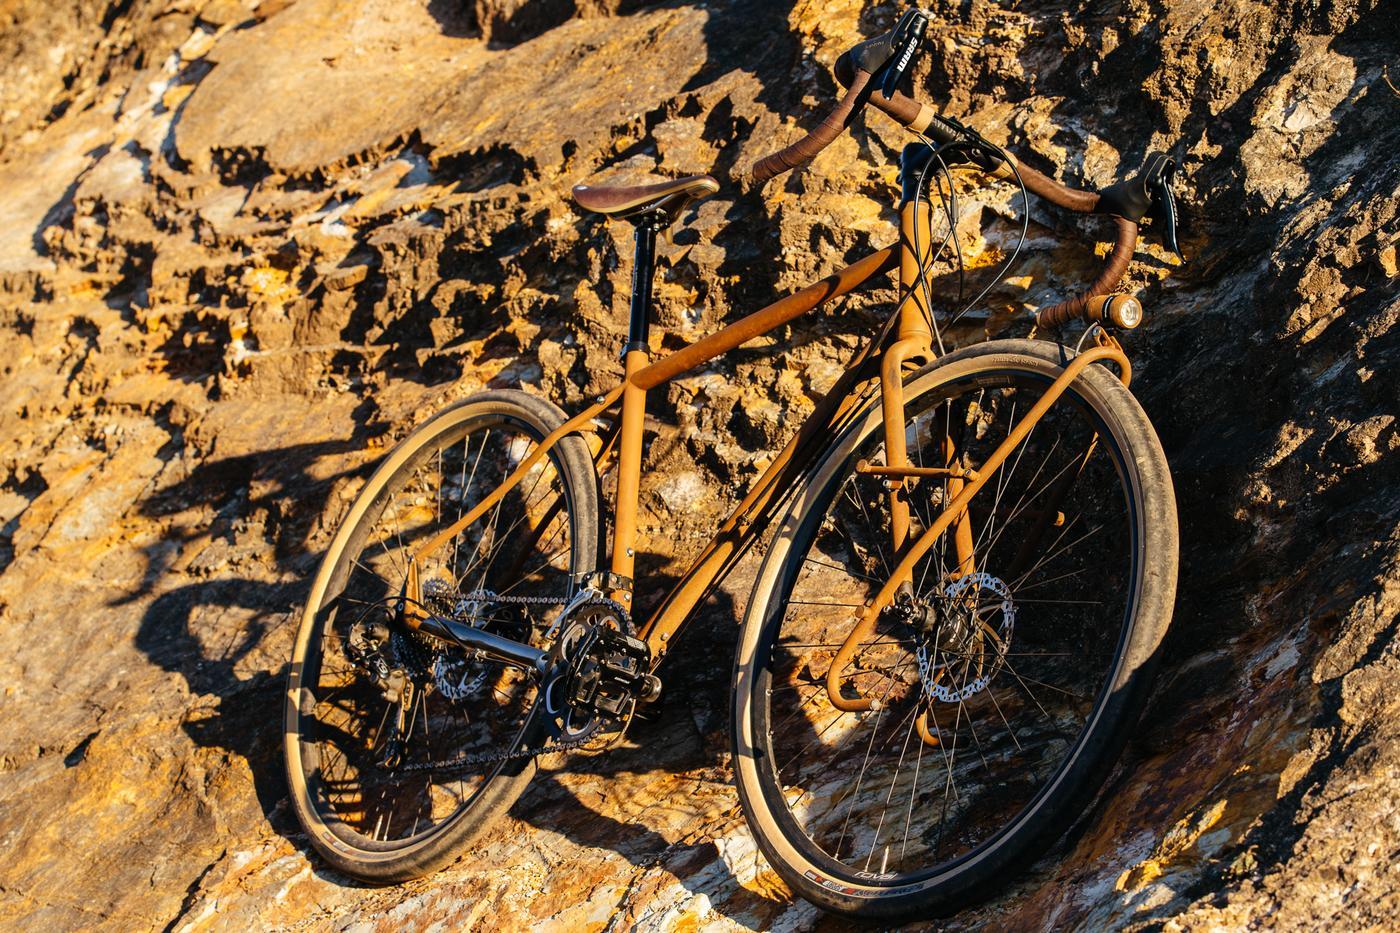 Rust Never Sleeps on Sofia's AWOL